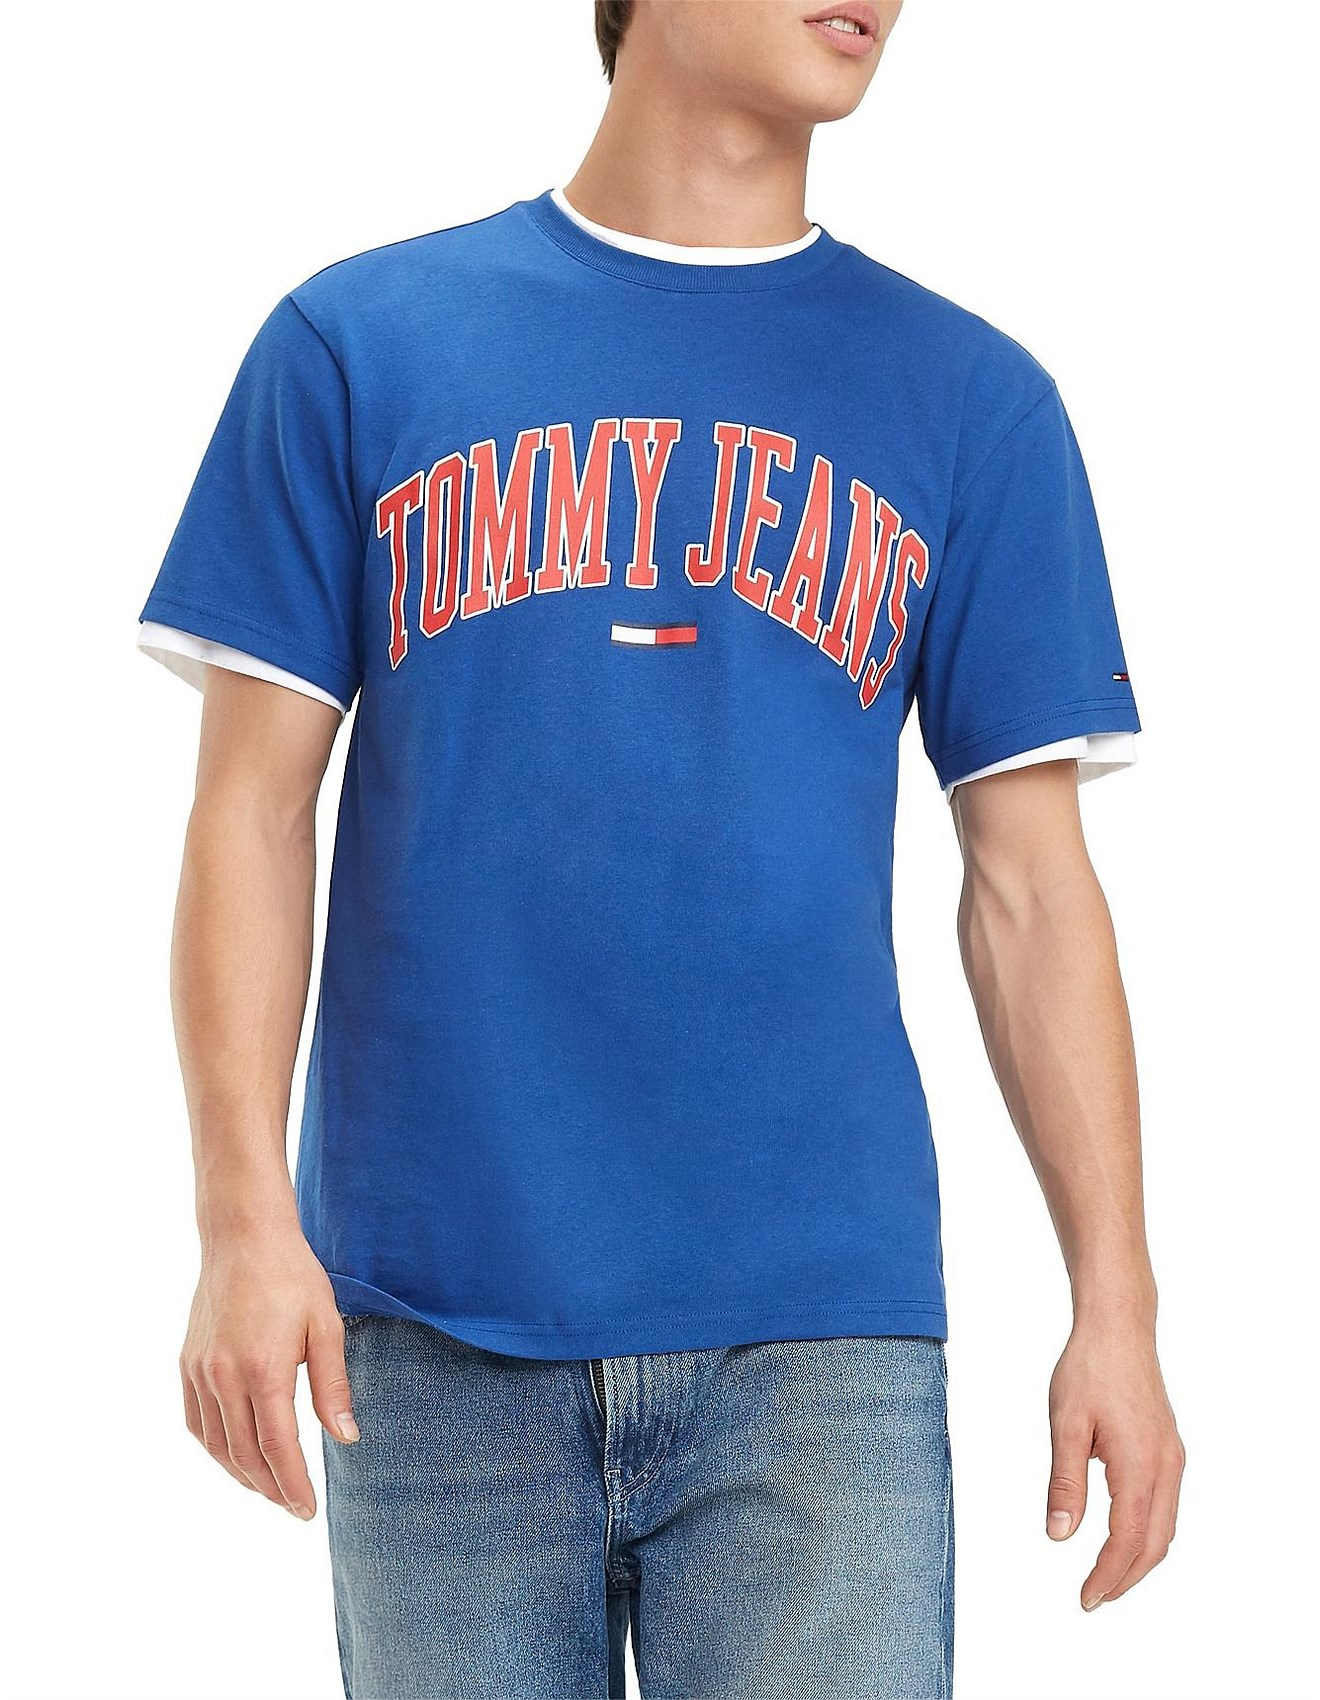 416f60ea Men's T-Shirts Sale | Long Sleeved & Short Sleeved | David Jones - TJM  COLLEGIATE LOGO TEE